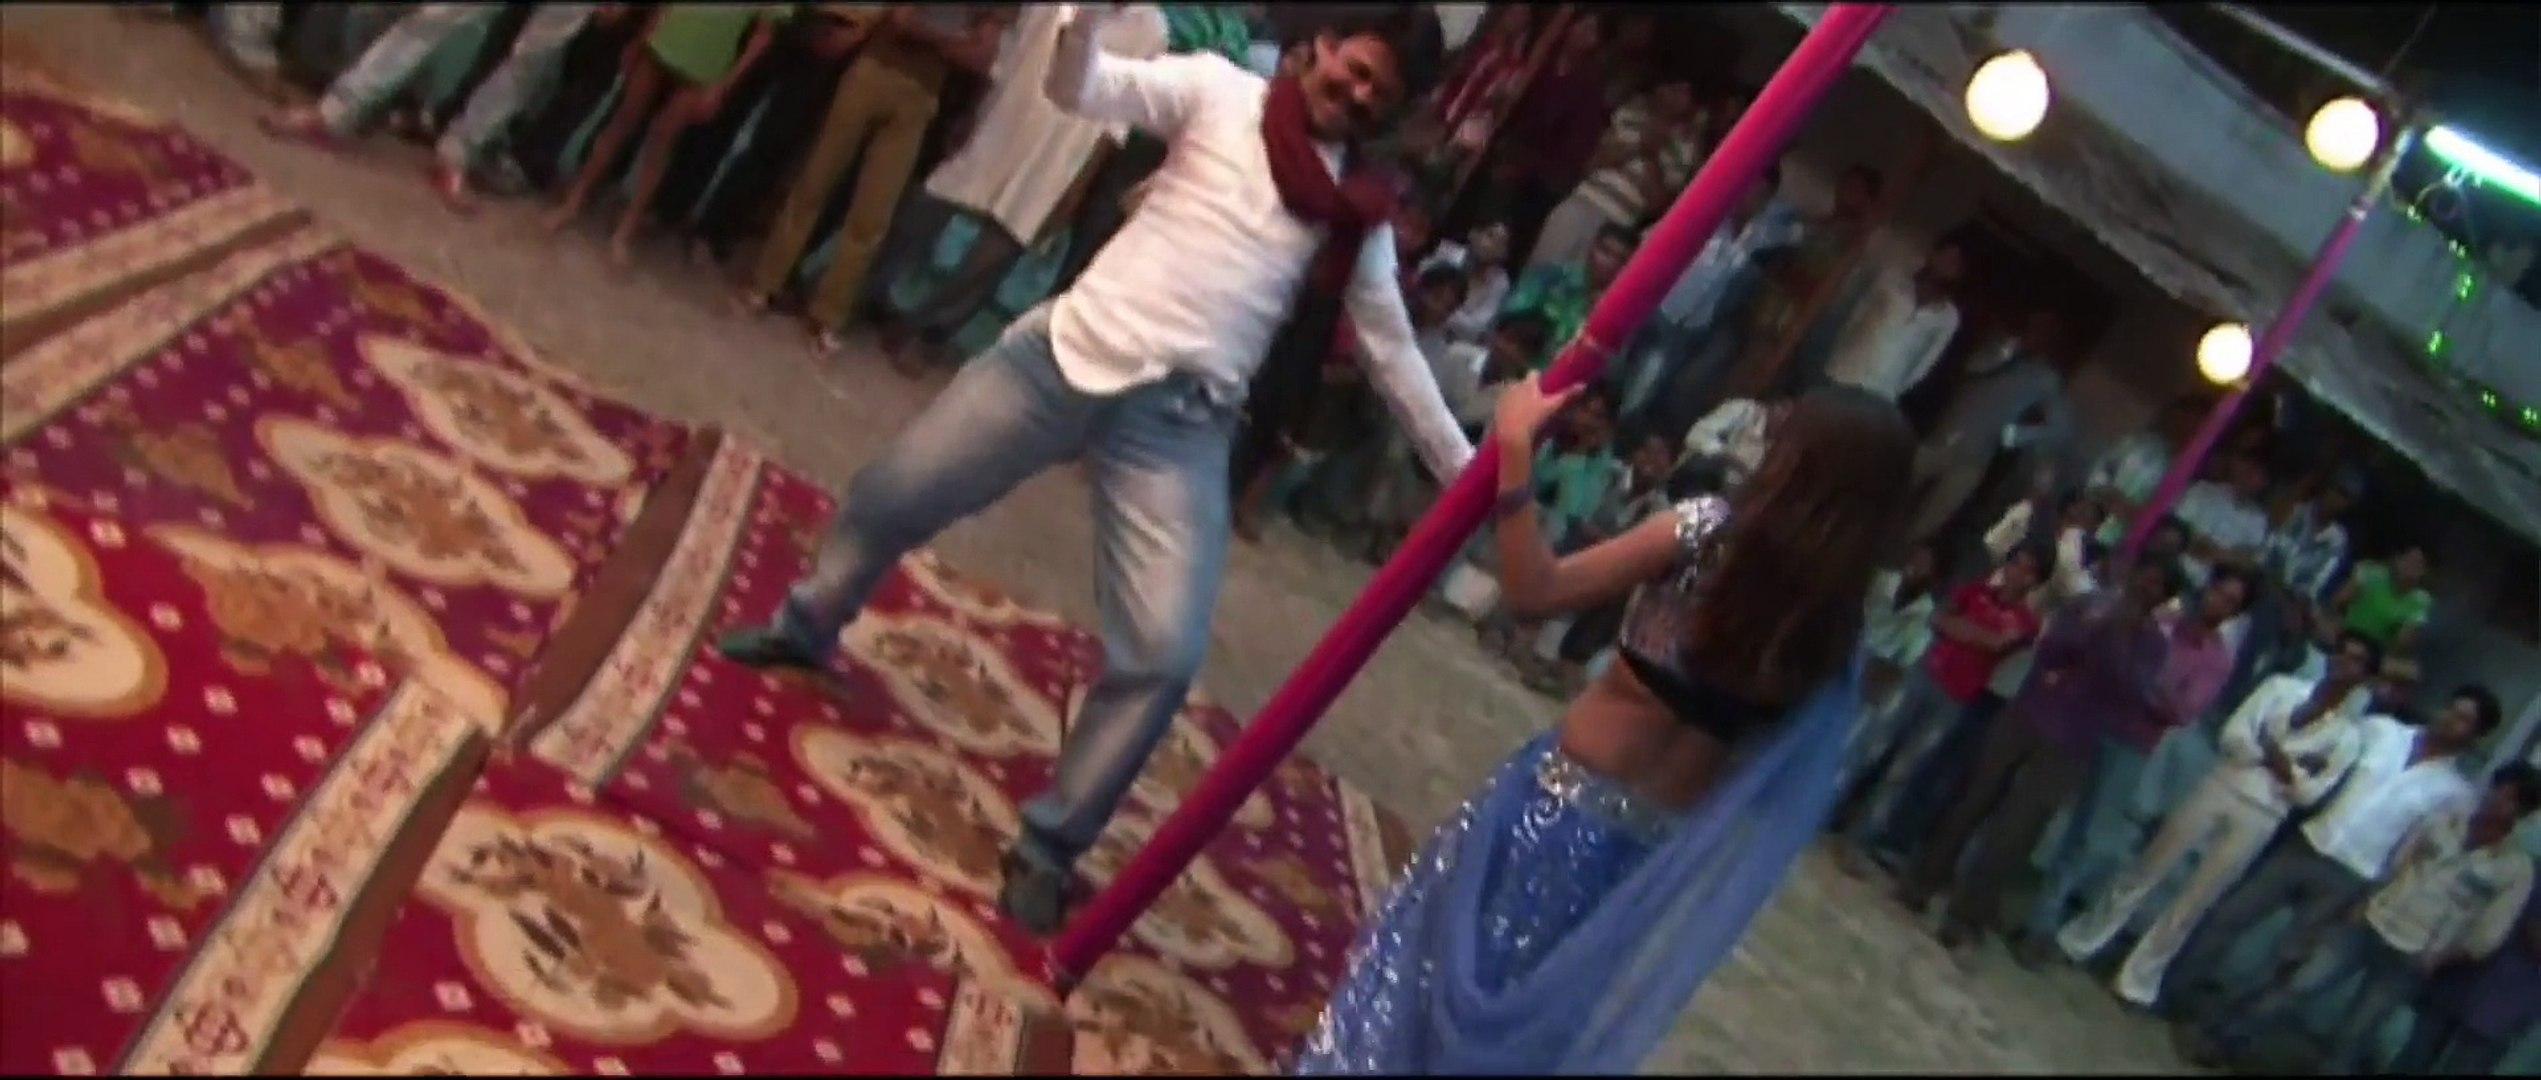 Tere Gaon Mein Aa ke - Video Song - Movie: Gaon Ki Maati - Singers: Raju Anand, Surabhi